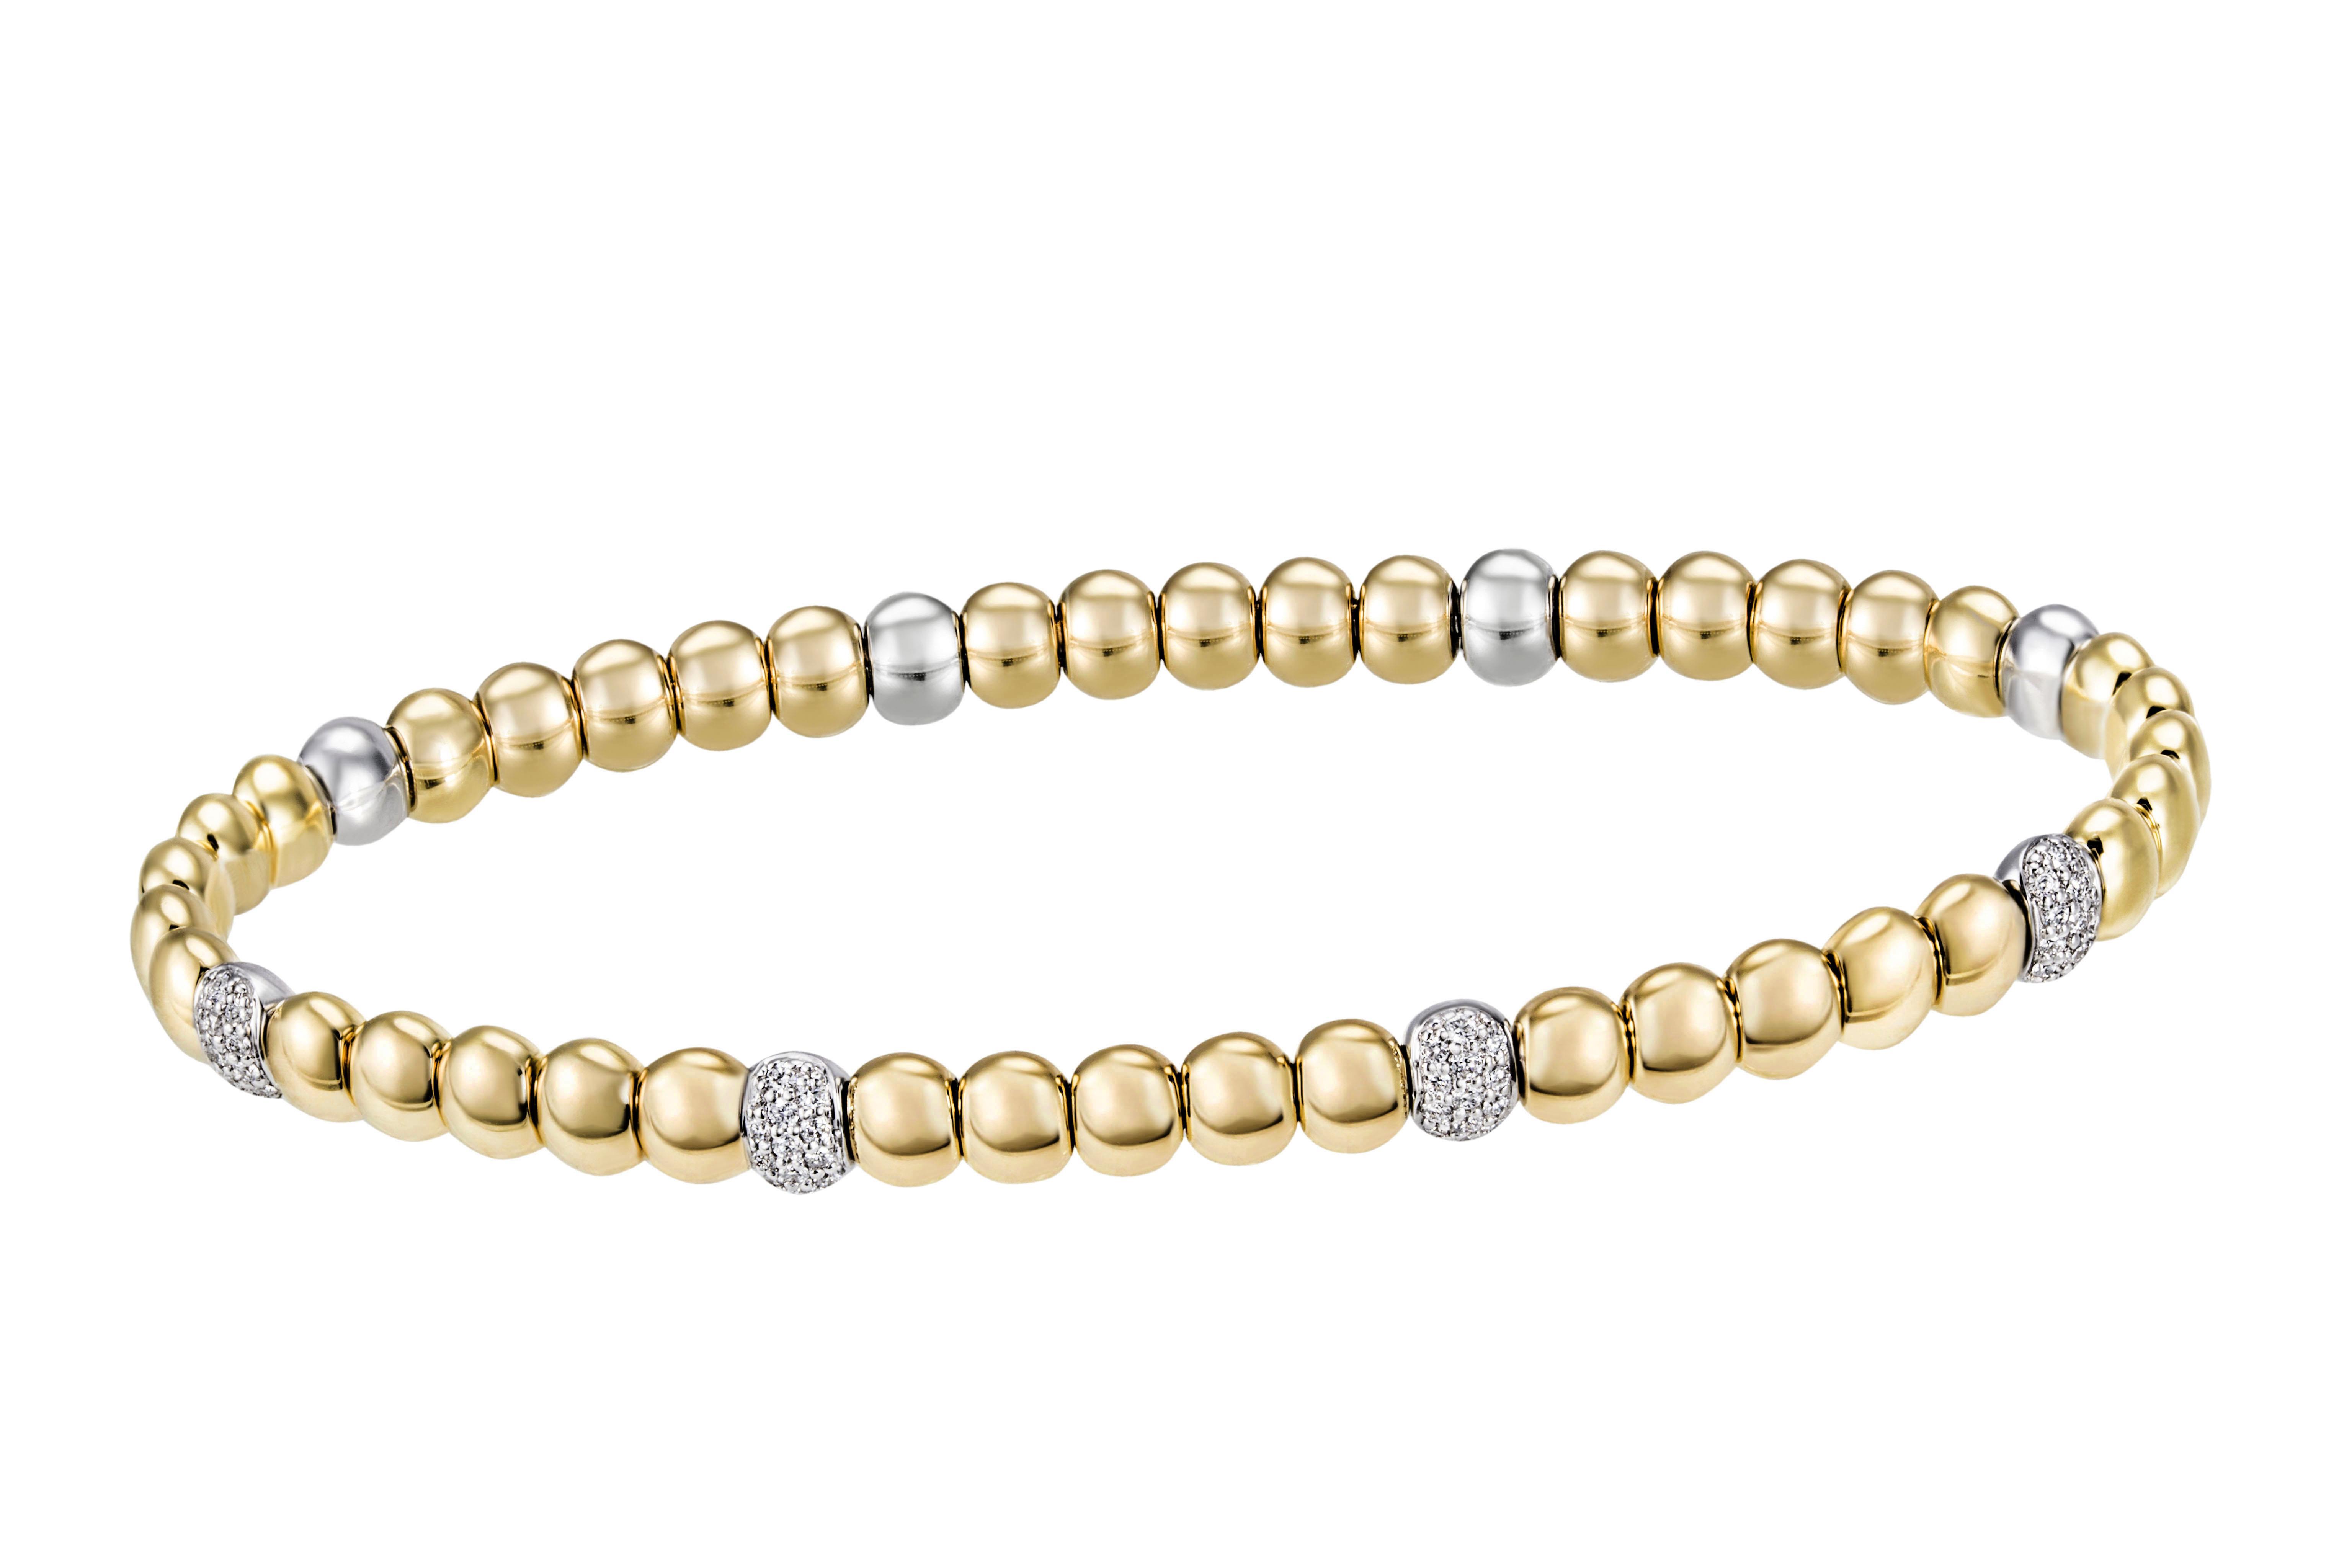 Armband mit Brillanten 750 Gold Bicolor